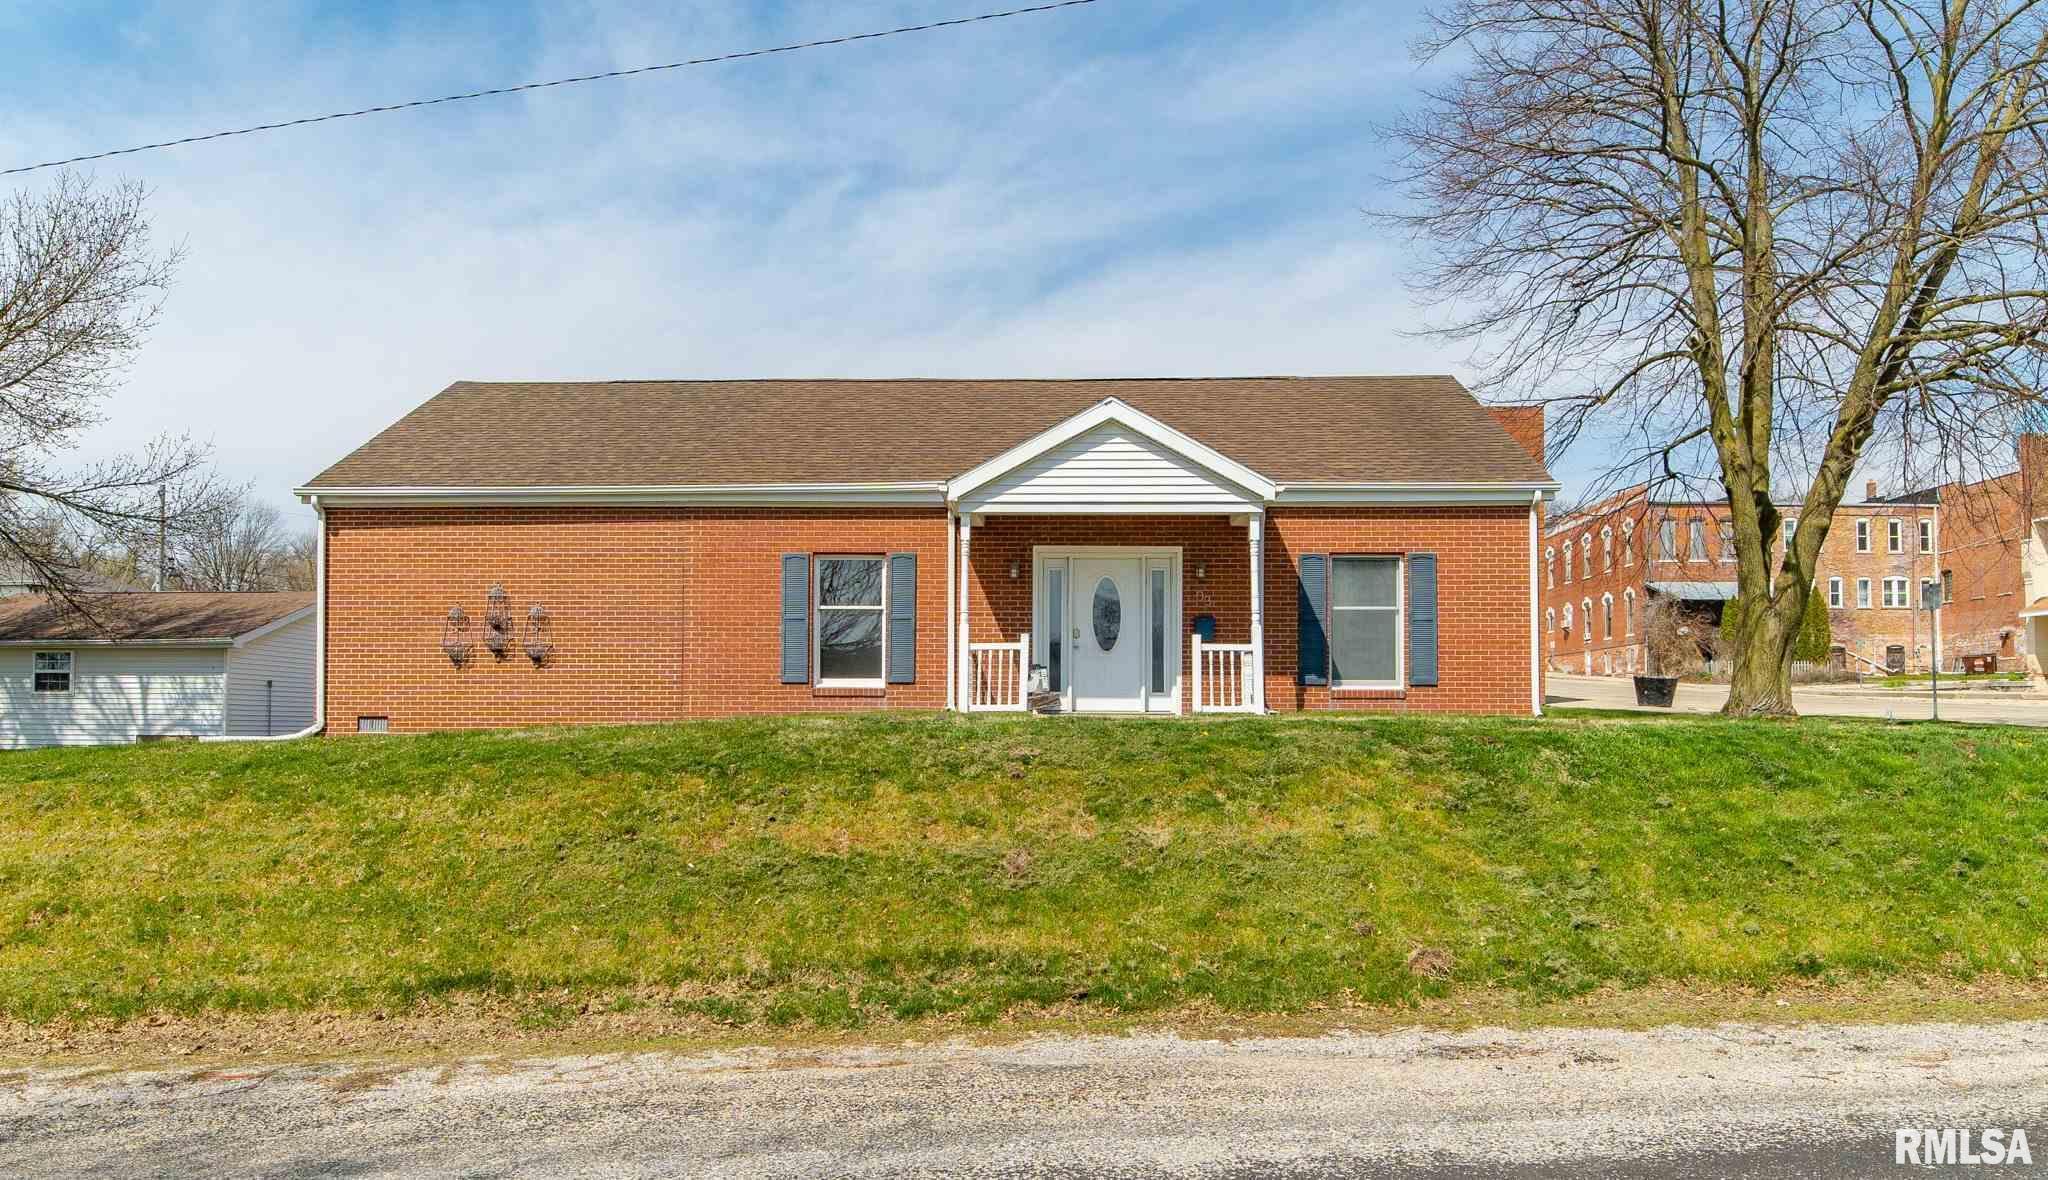 103 W WAYNE Property Photo - Mt Pulaski, IL real estate listing